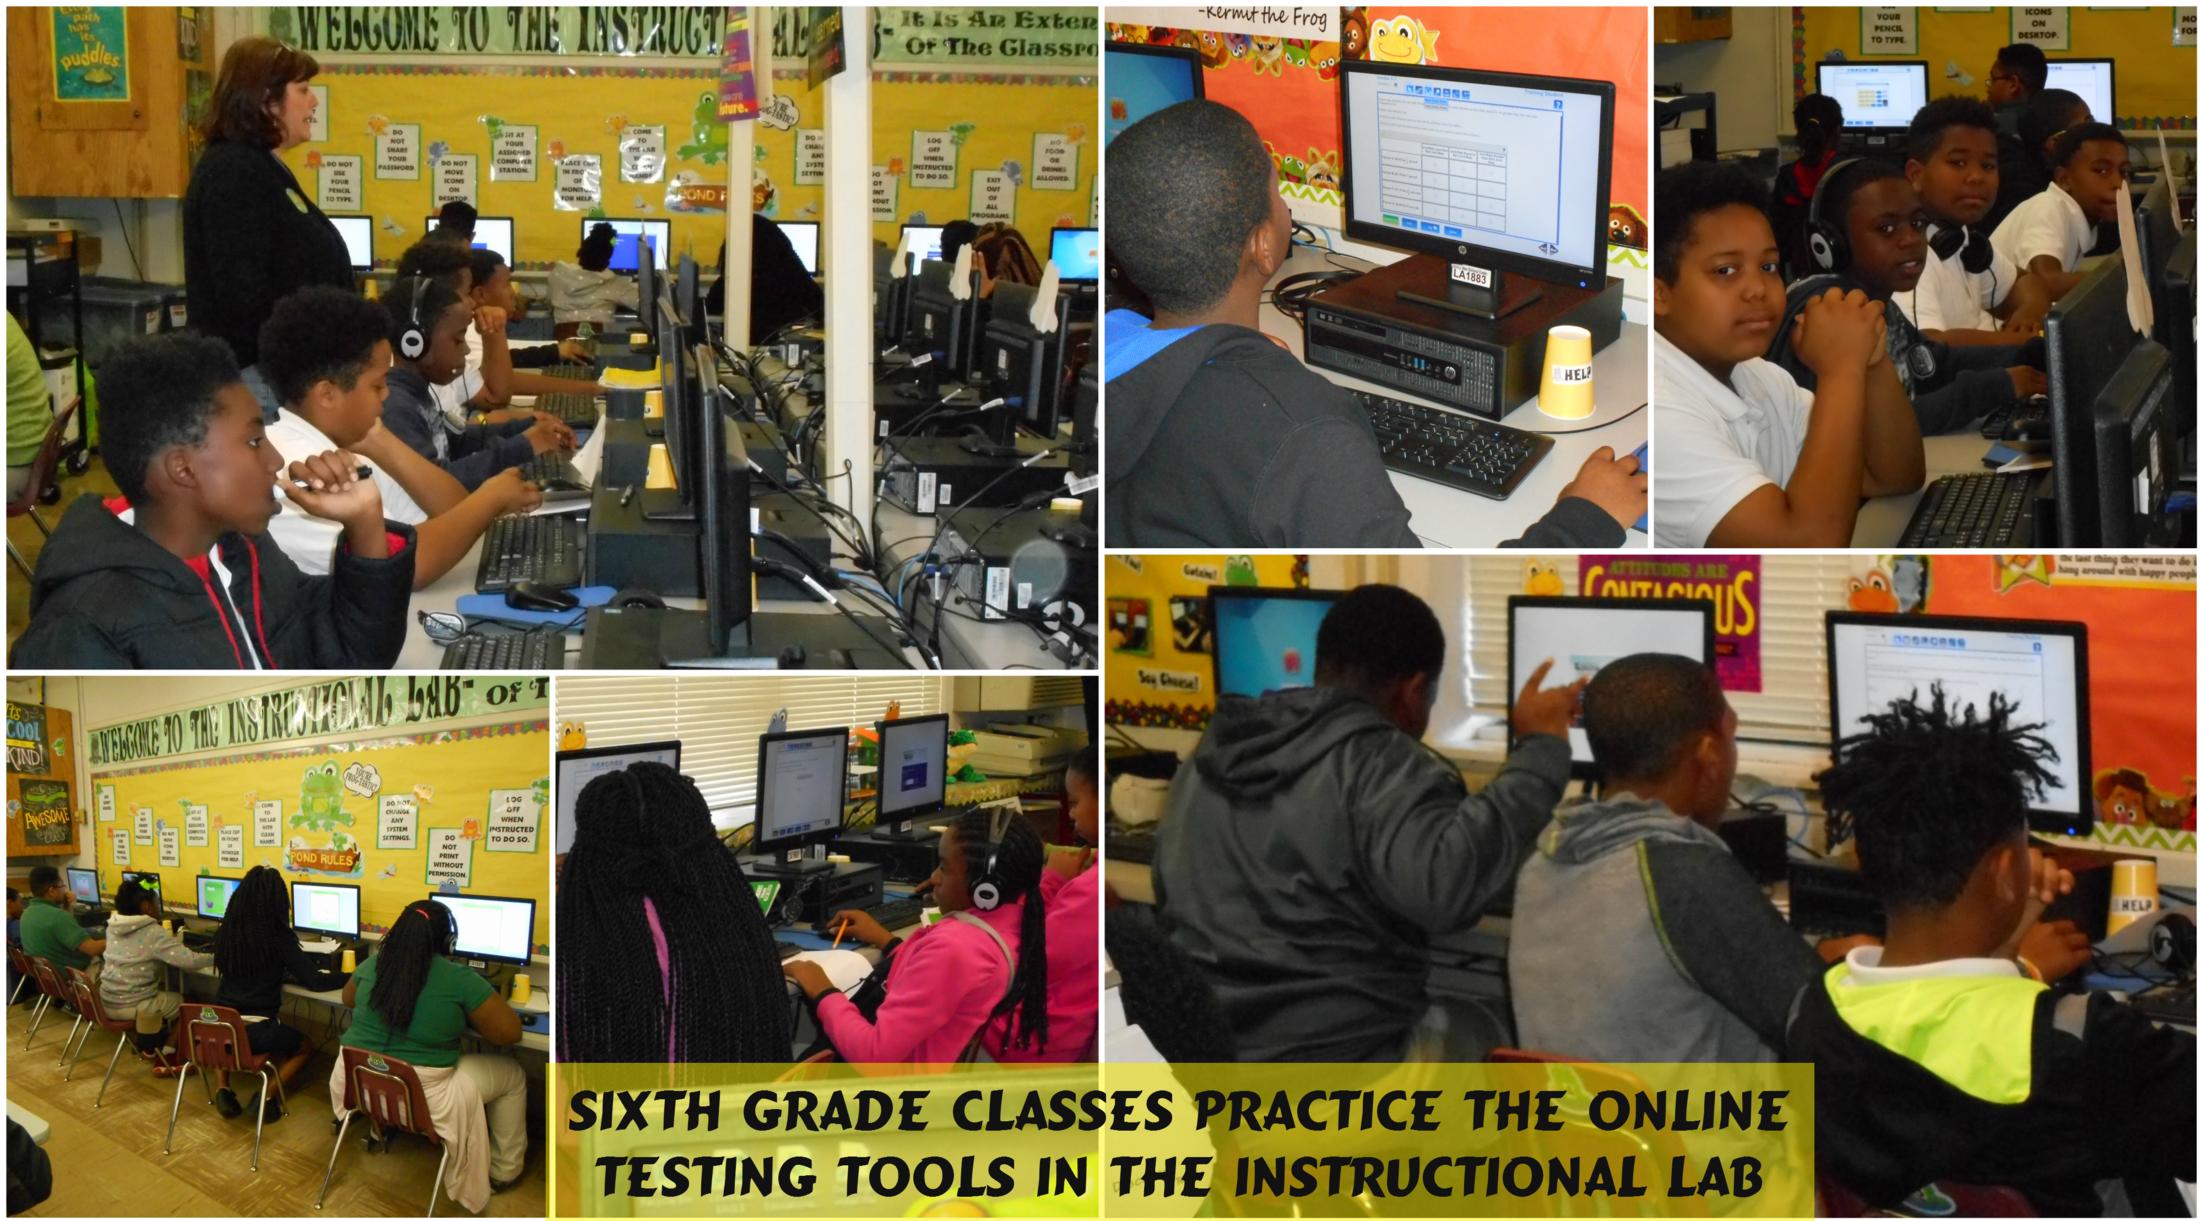 Sixth Grade practicing online tools